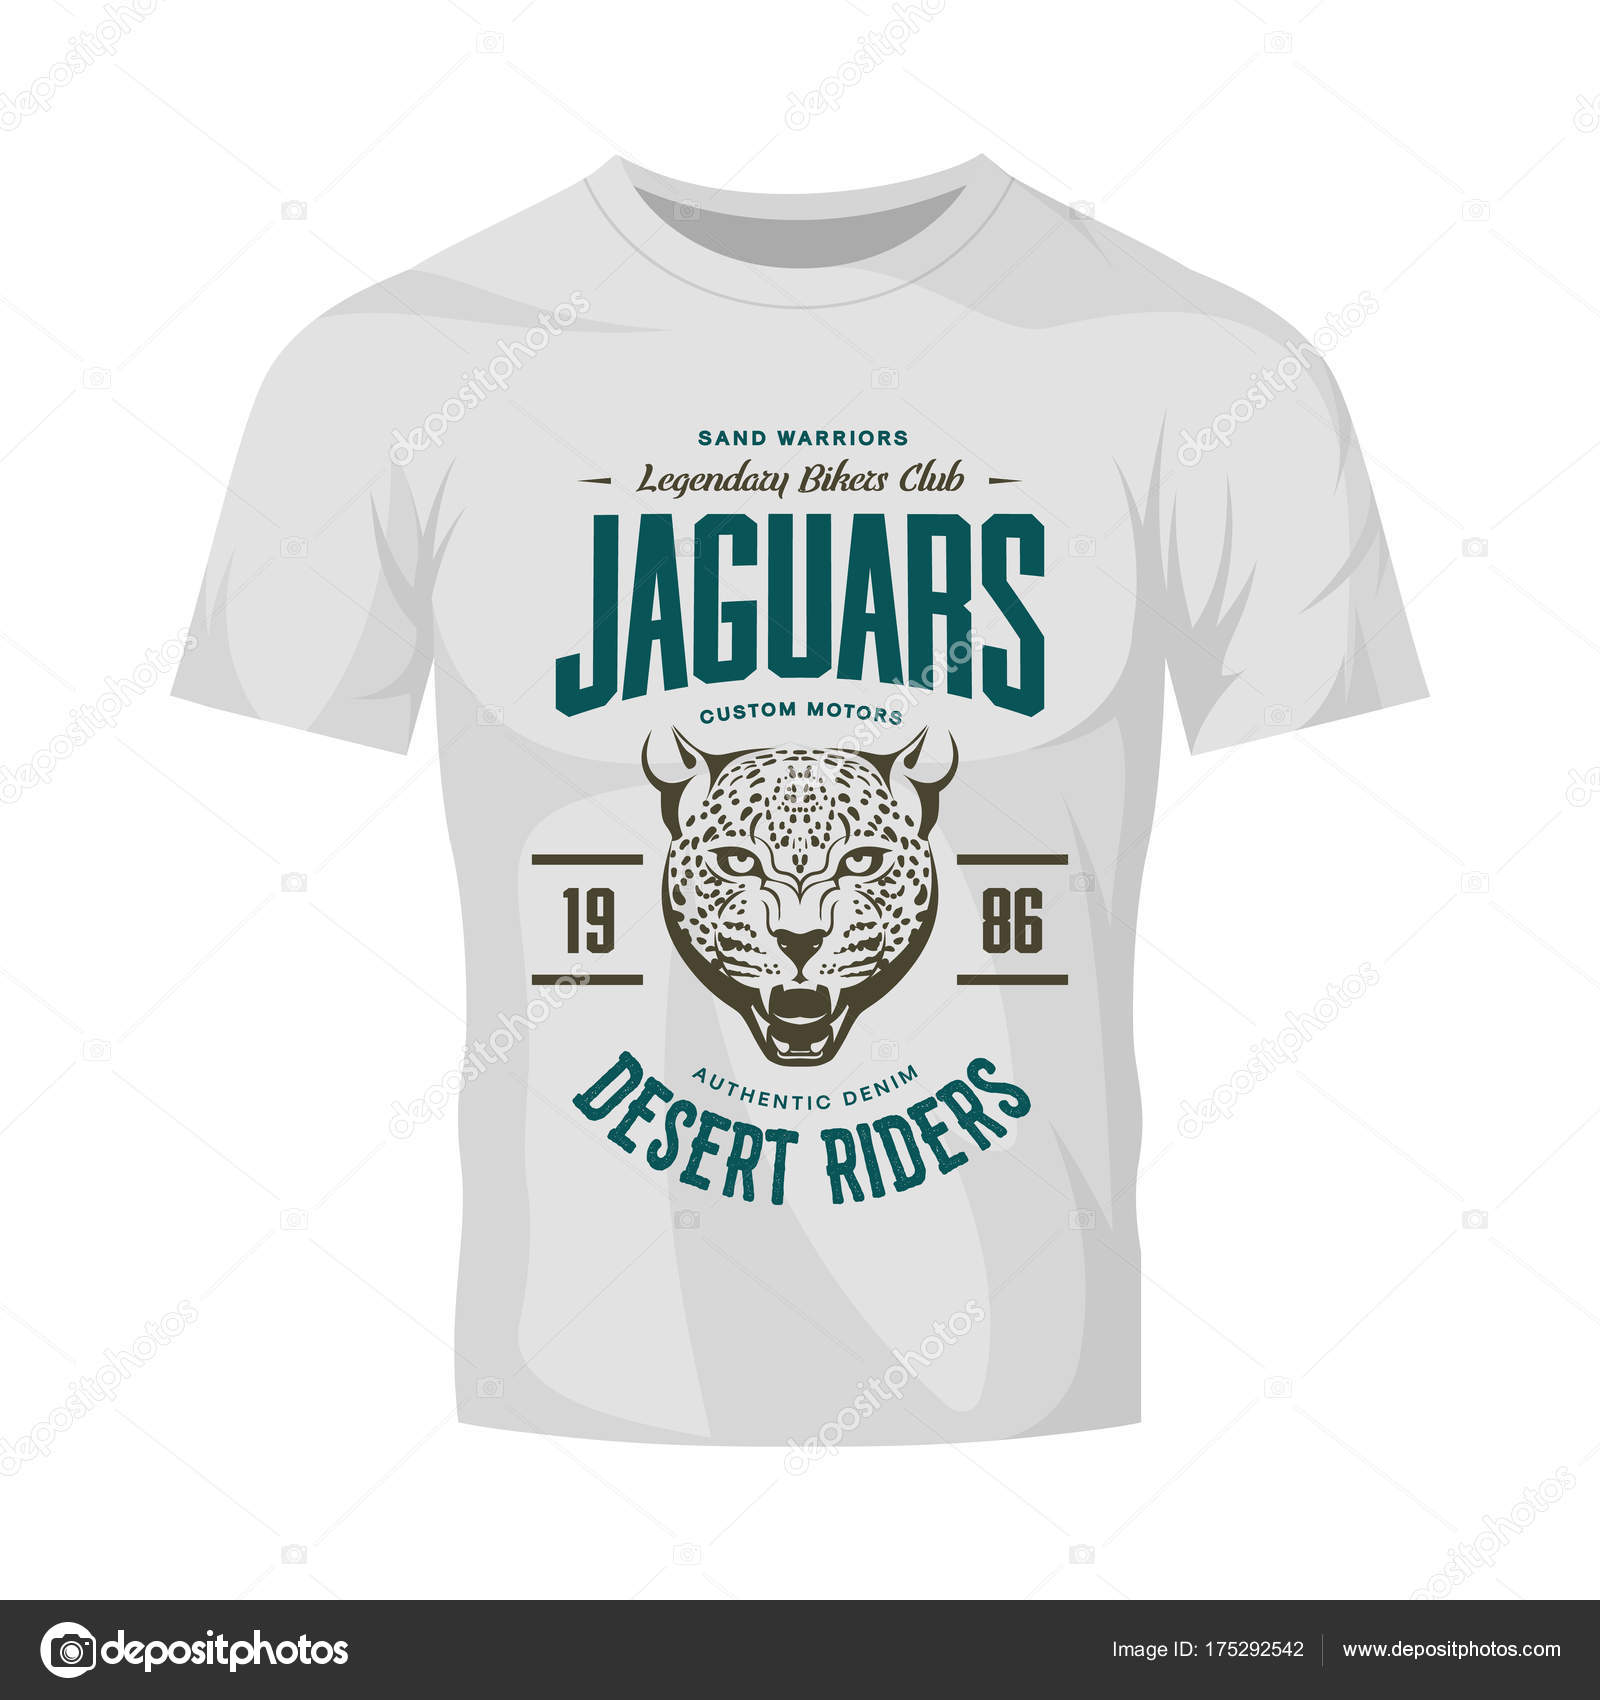 hi fender tee jaguar brand lucky res shirts t